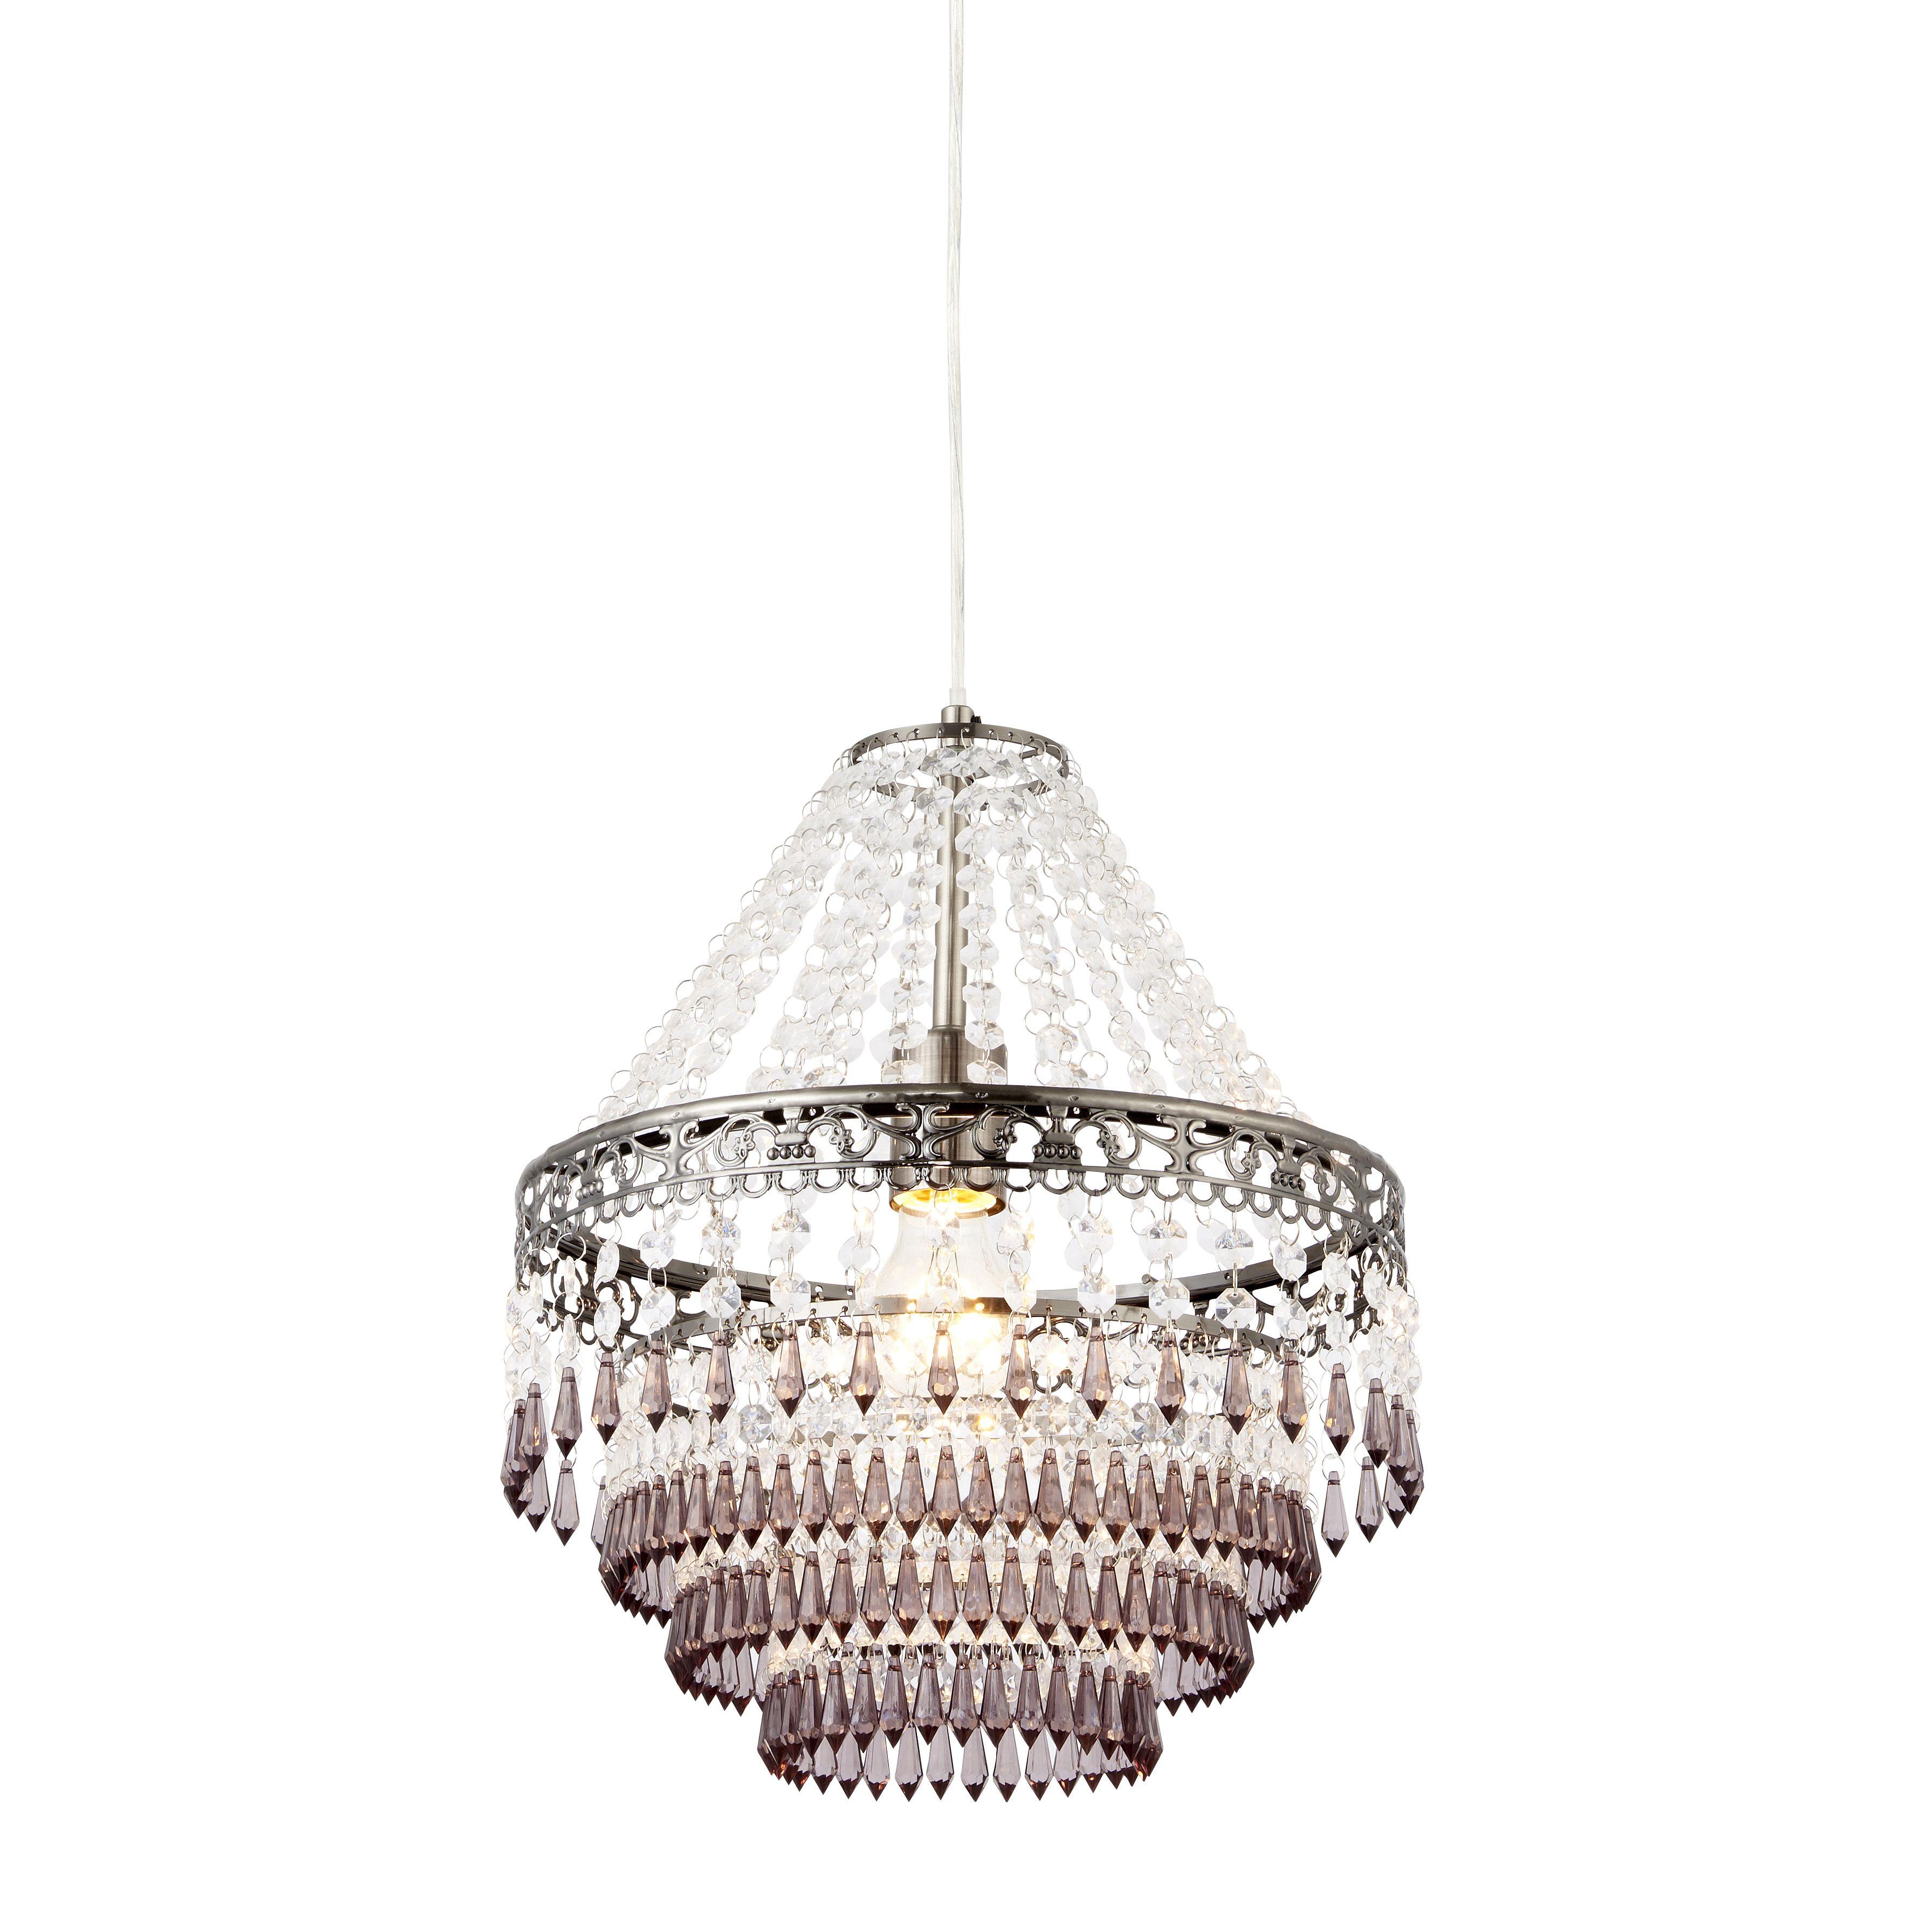 Pleasing 80 bathroom chandeliers b q design ideas of 529 for B q bedroom lighting